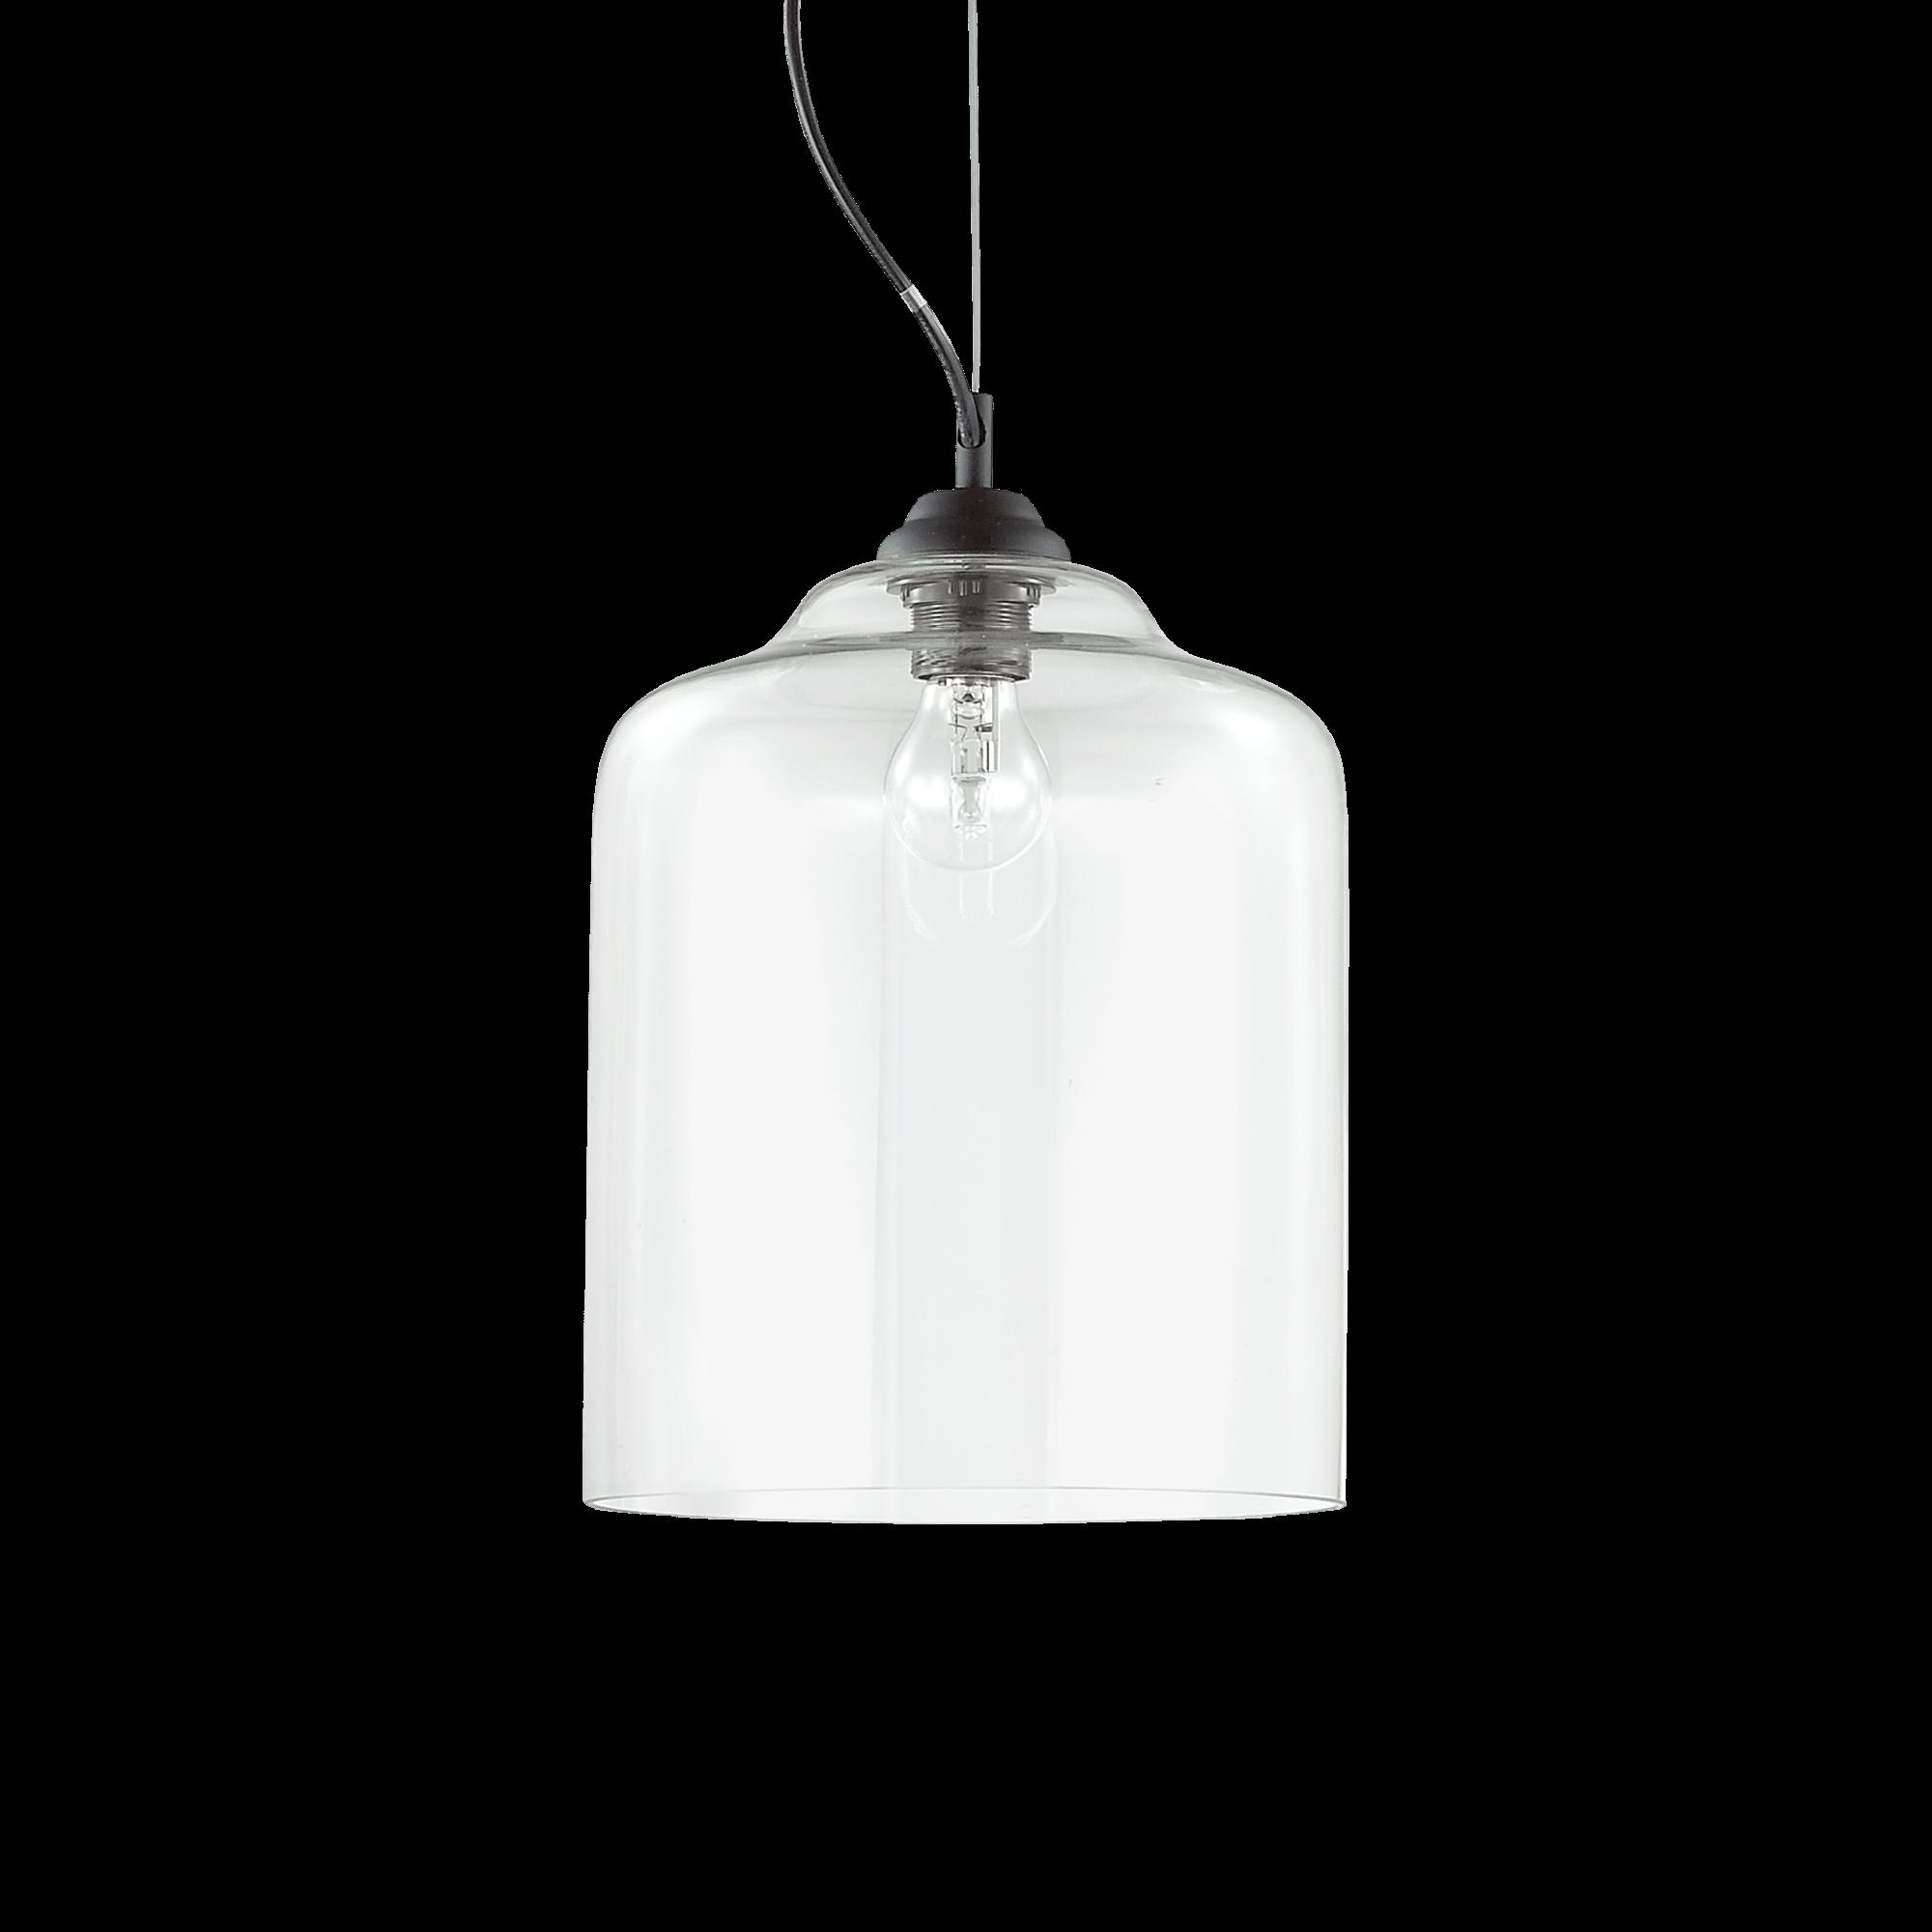 Ideal Lux 112305 Bistro SP1 Square Trasparente függeszték